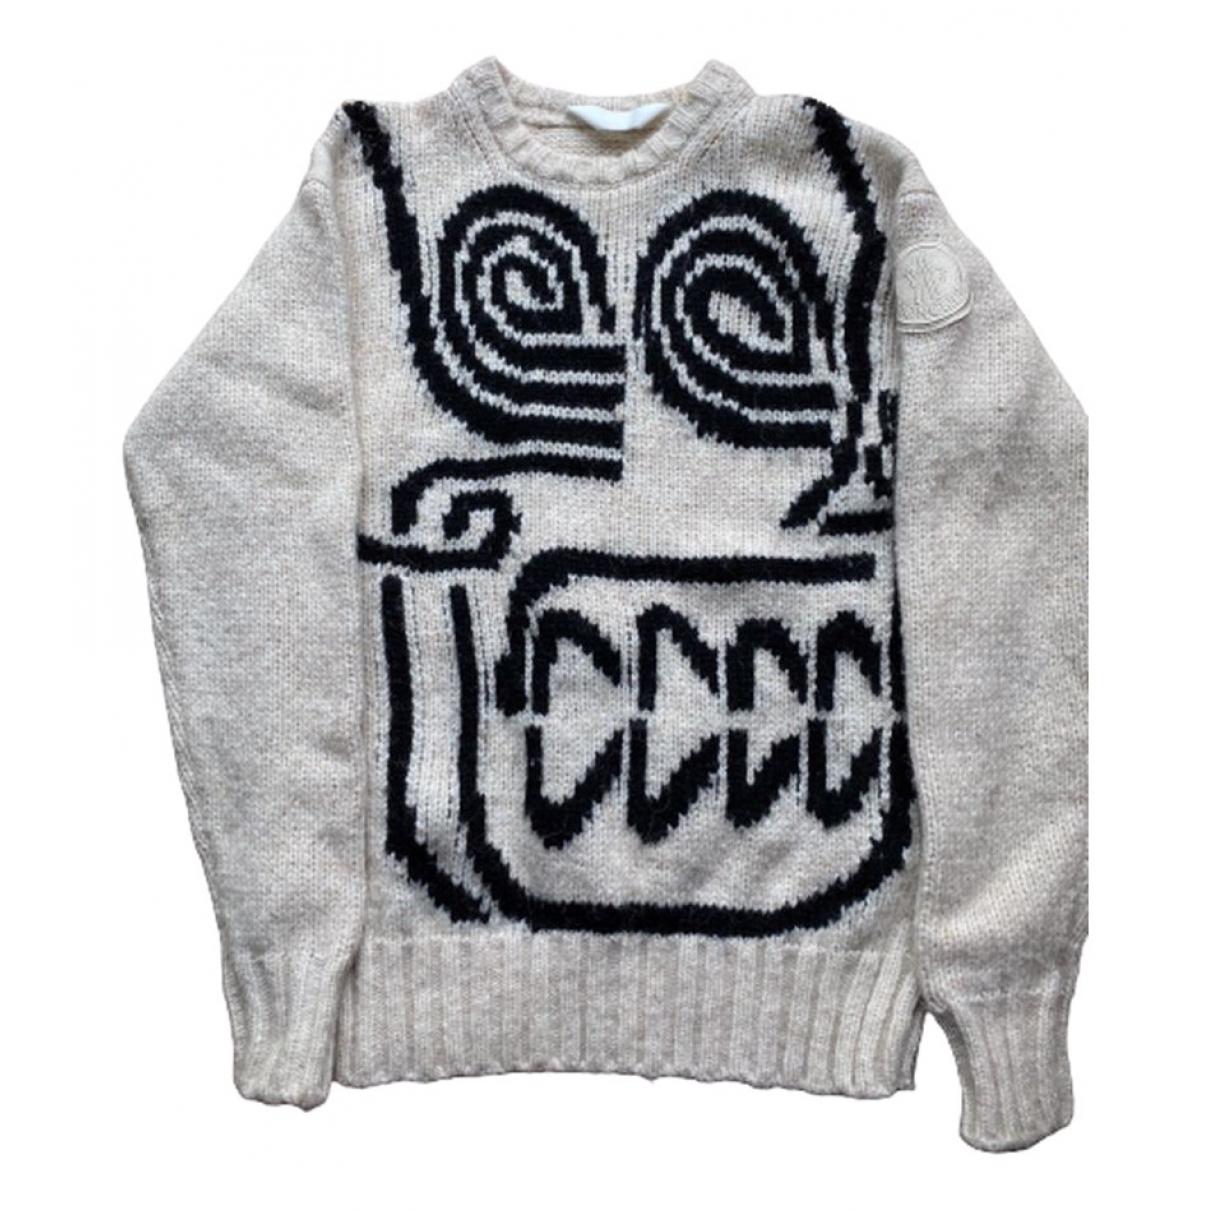 Moncler Genius Moncler n°2 1952 + Valextra Pullover.Westen.Sweatshirts  in  Weiss Wolle